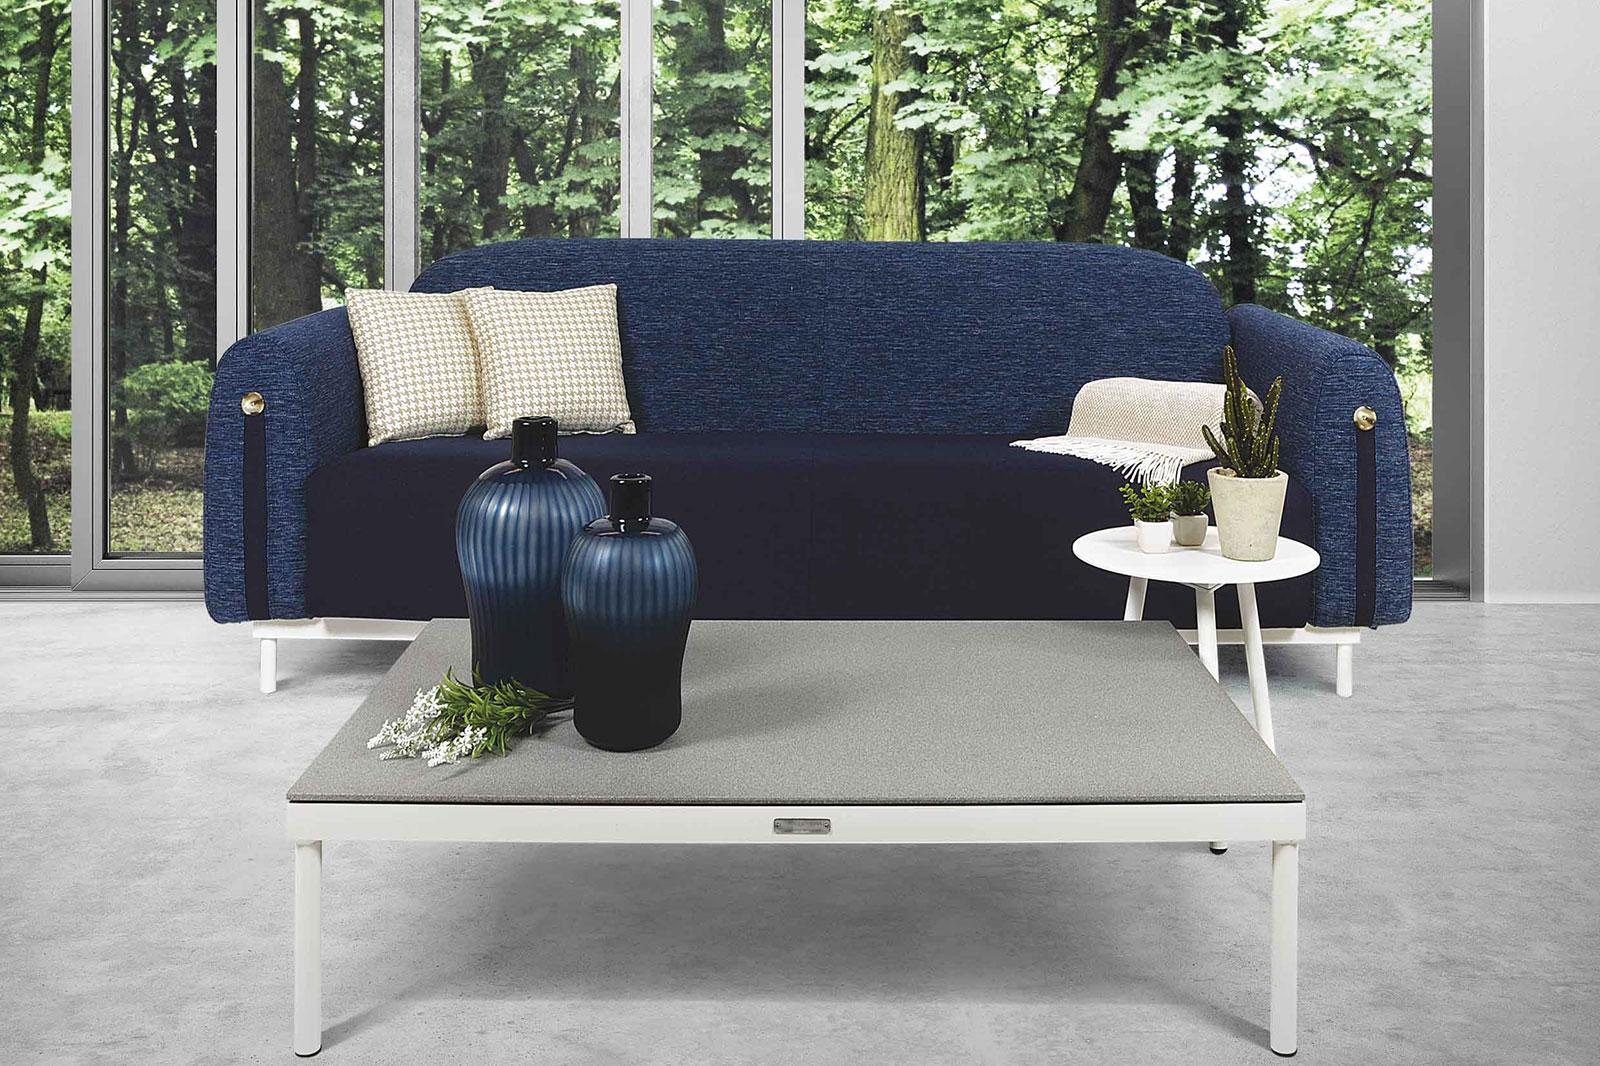 Bohemien divano da giardino vendita online italy dream design